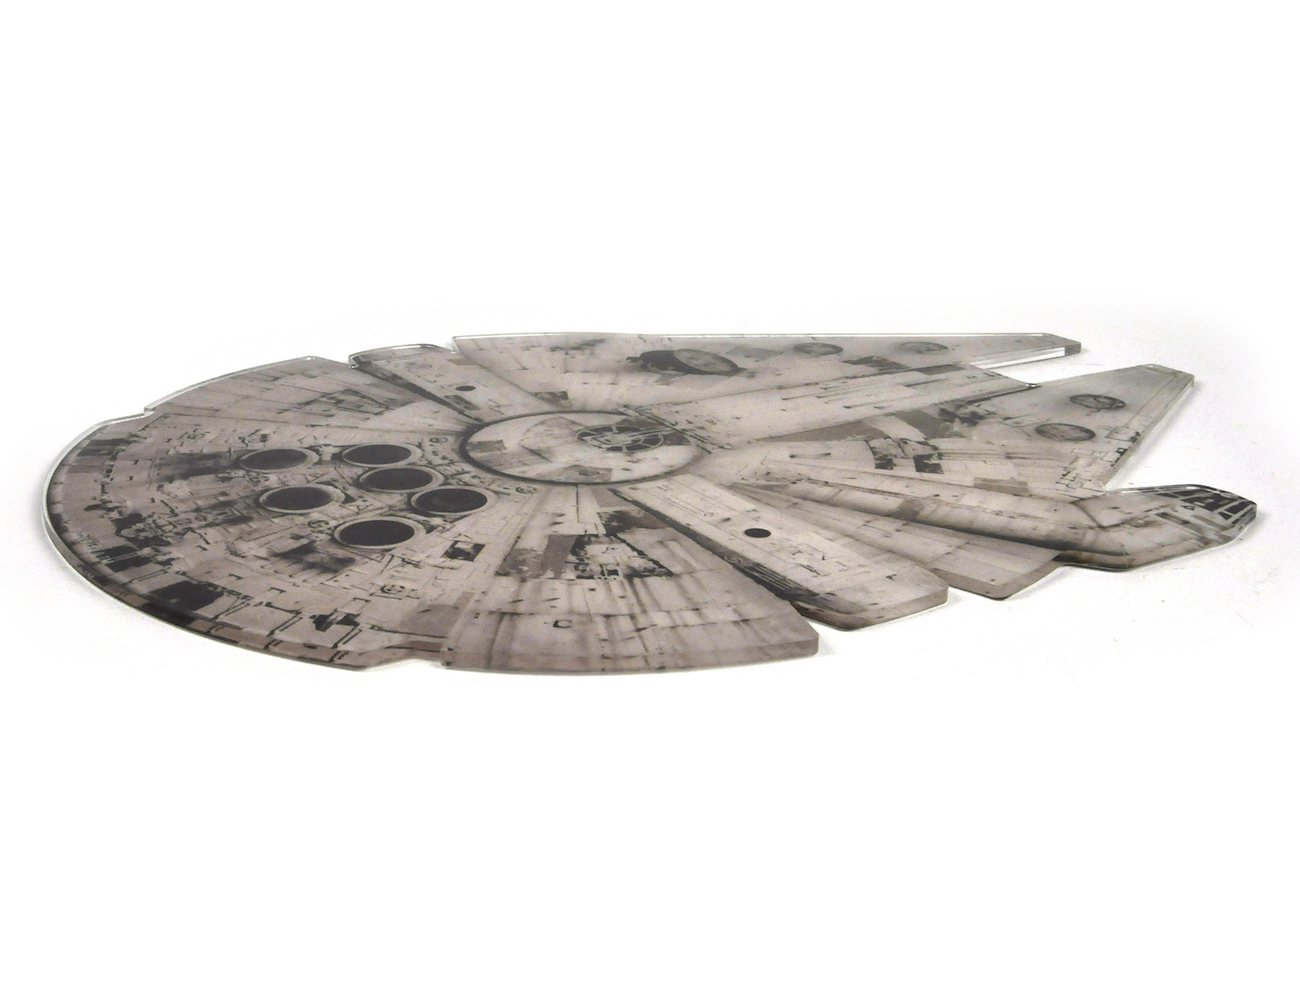 star-wars-millennium-falcon-chopping-board-04